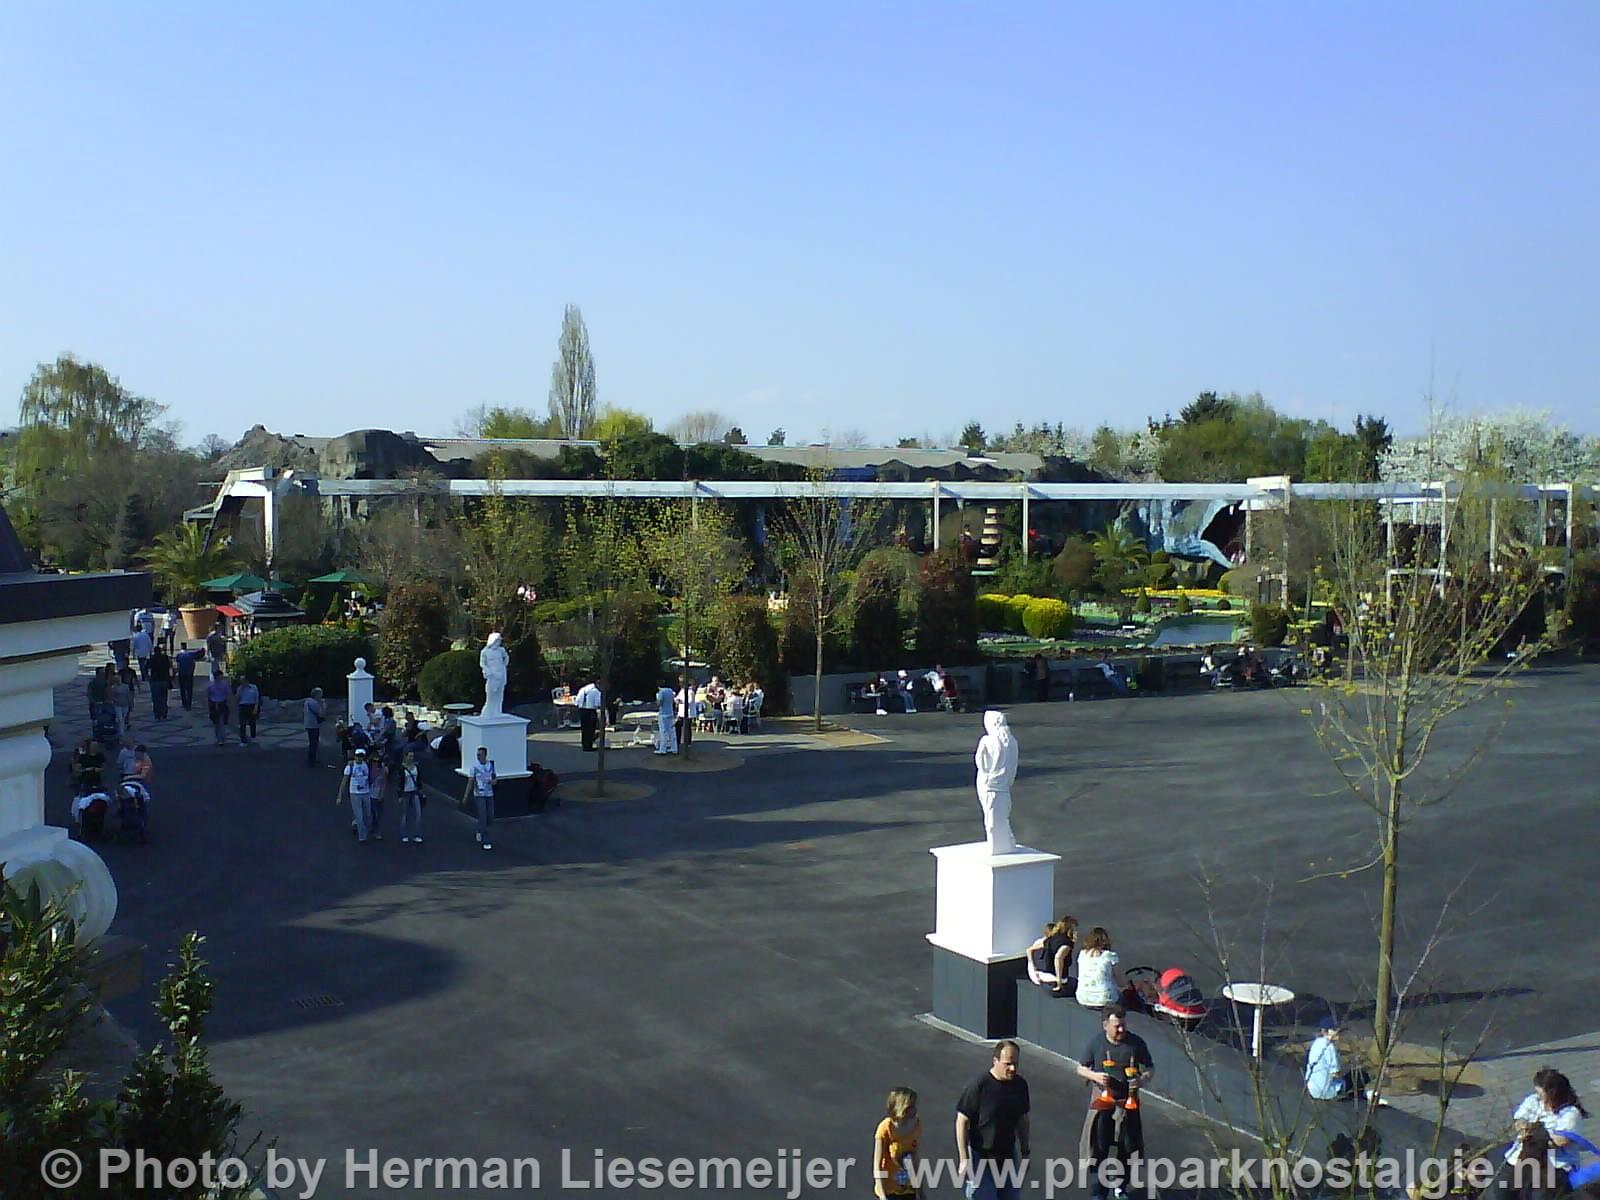 Phantasialand - Lege plek Brandenburger Tor en Gondelbahn in laatste jaar 2009.